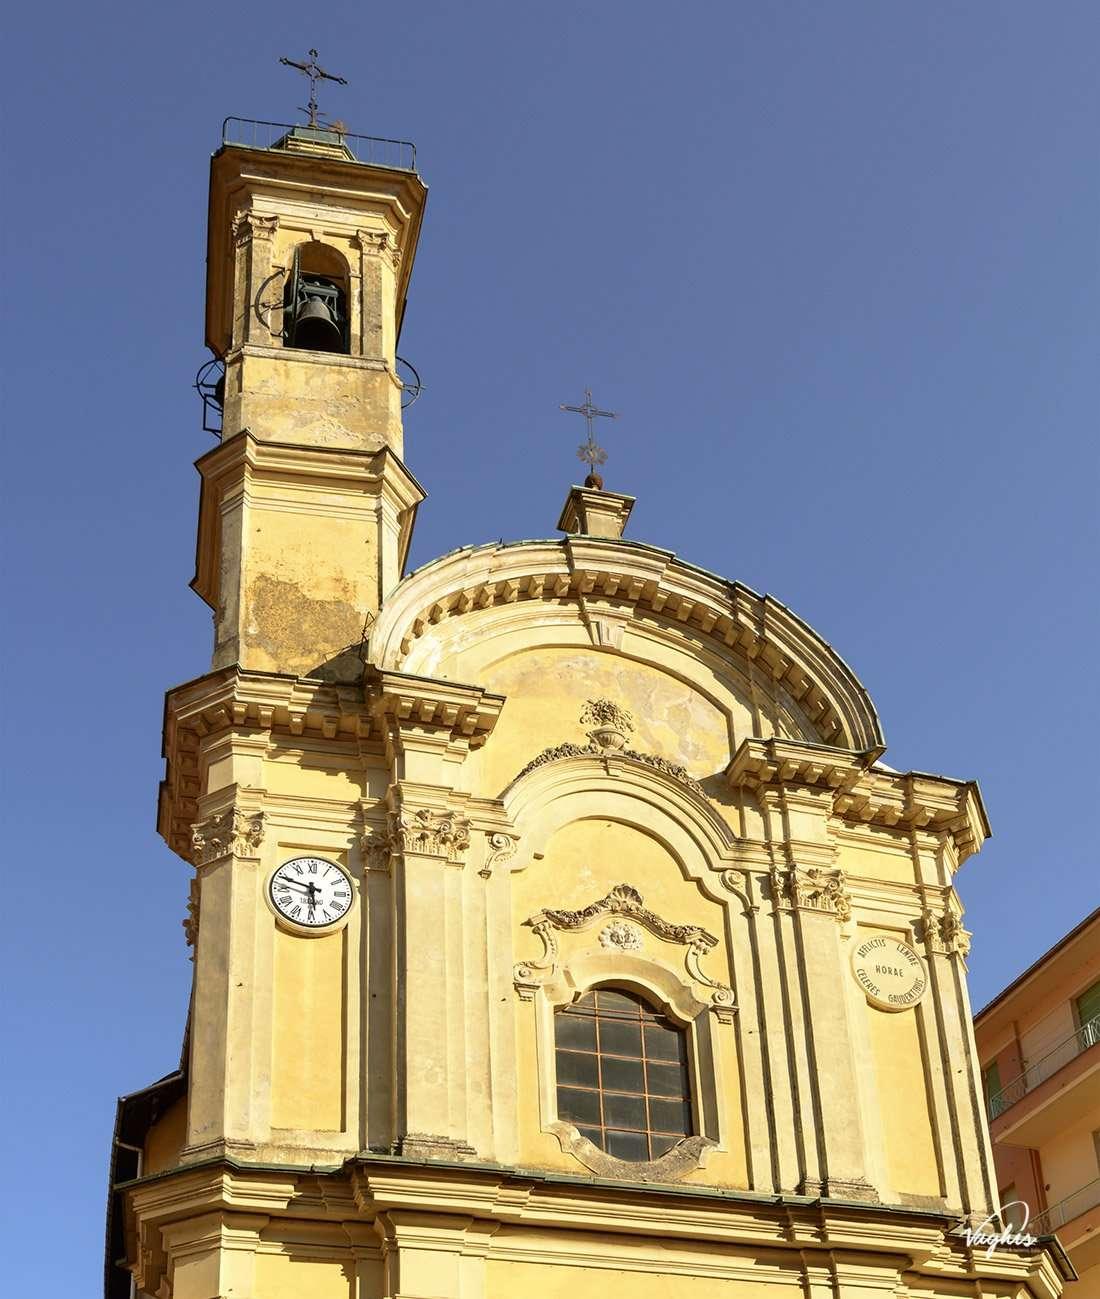 Campo Ligure - Oratorio di Nostra Signora Assunta